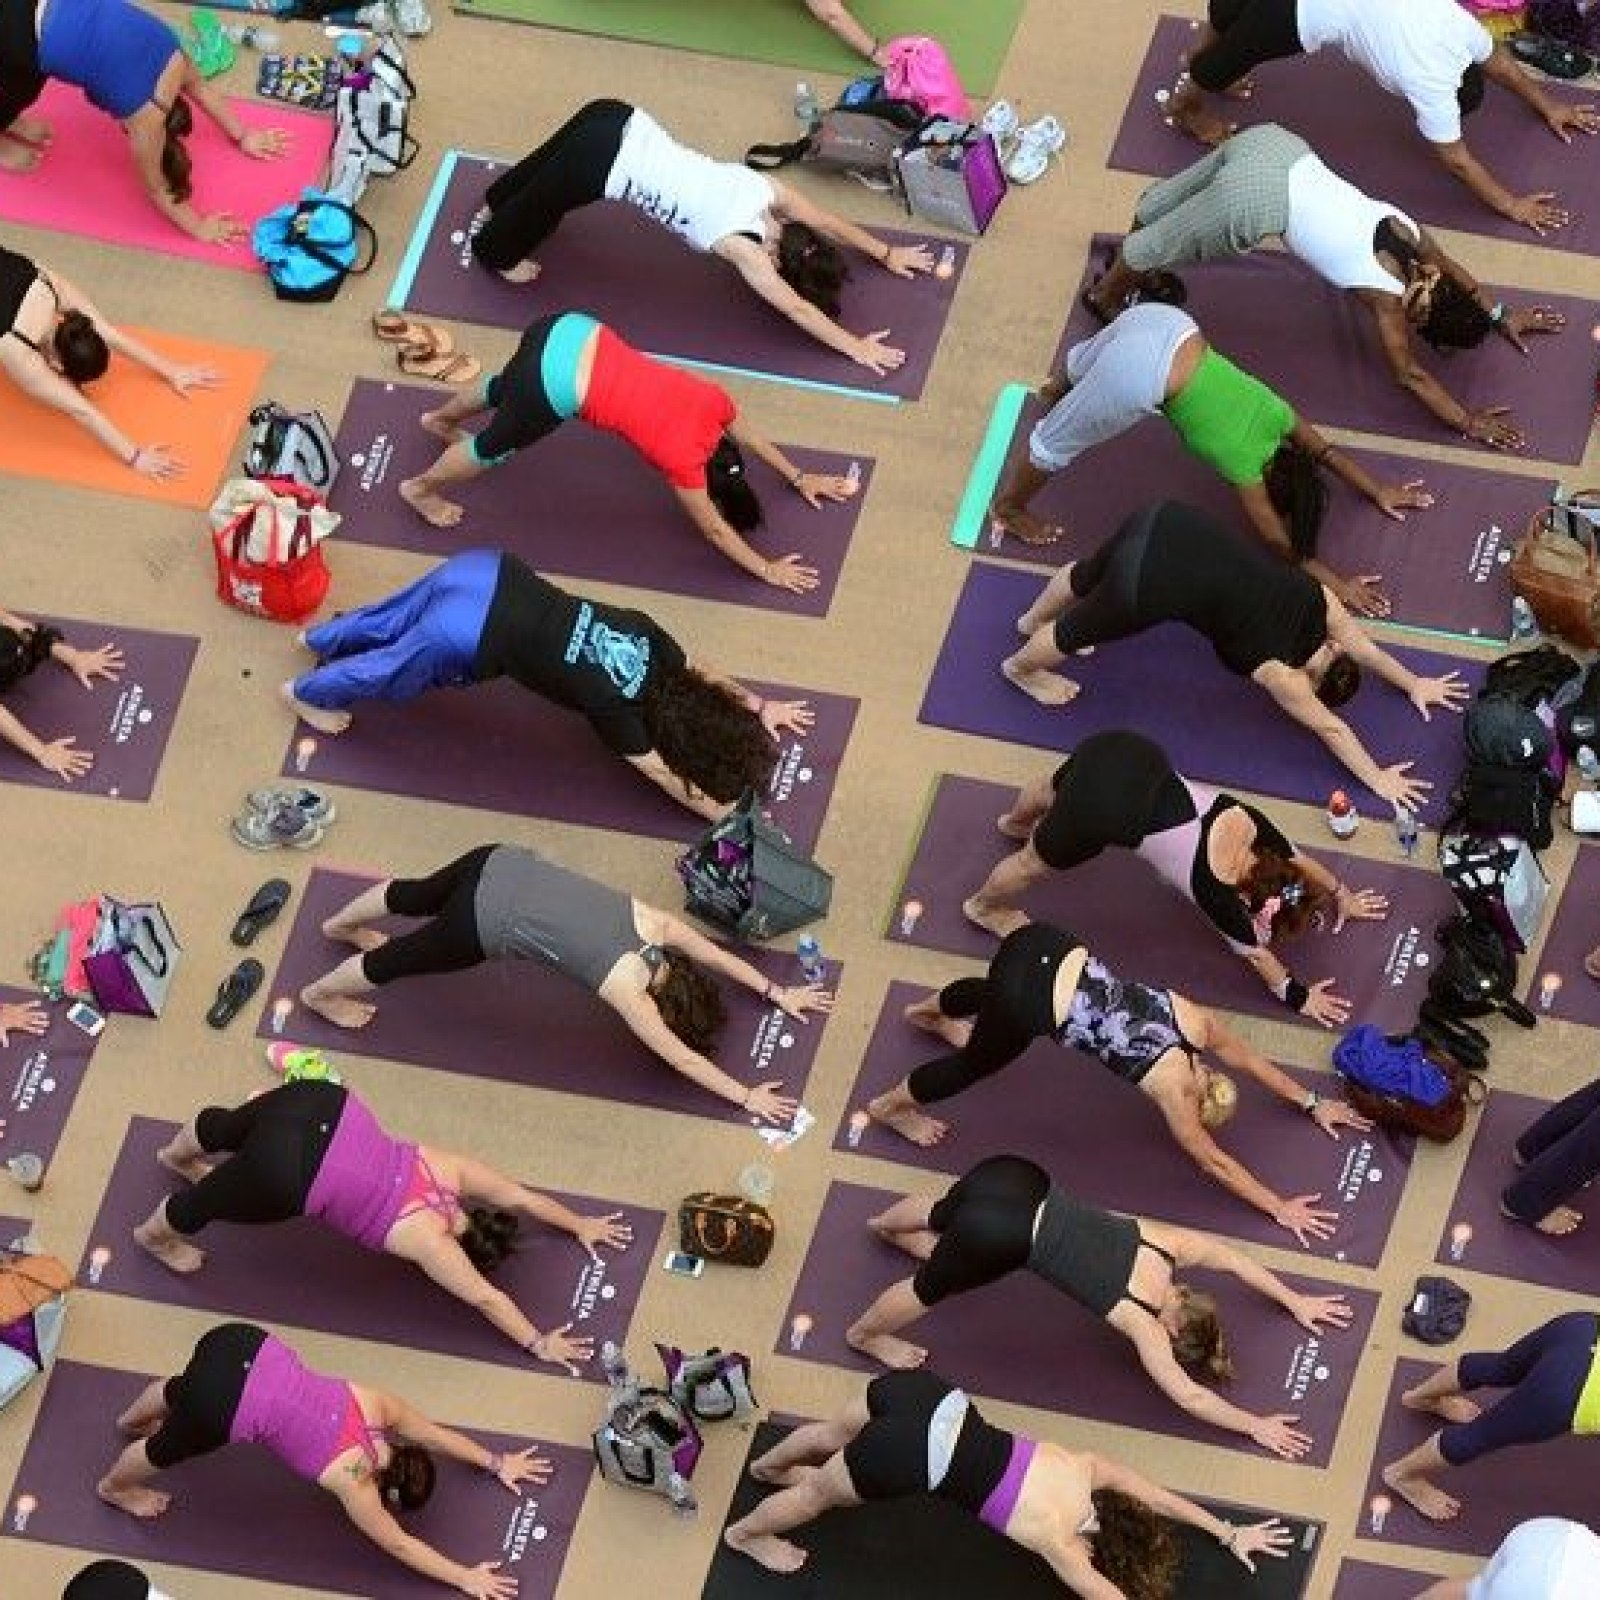 f51e48e08 Plus-Sized Women Want Yoga Chic